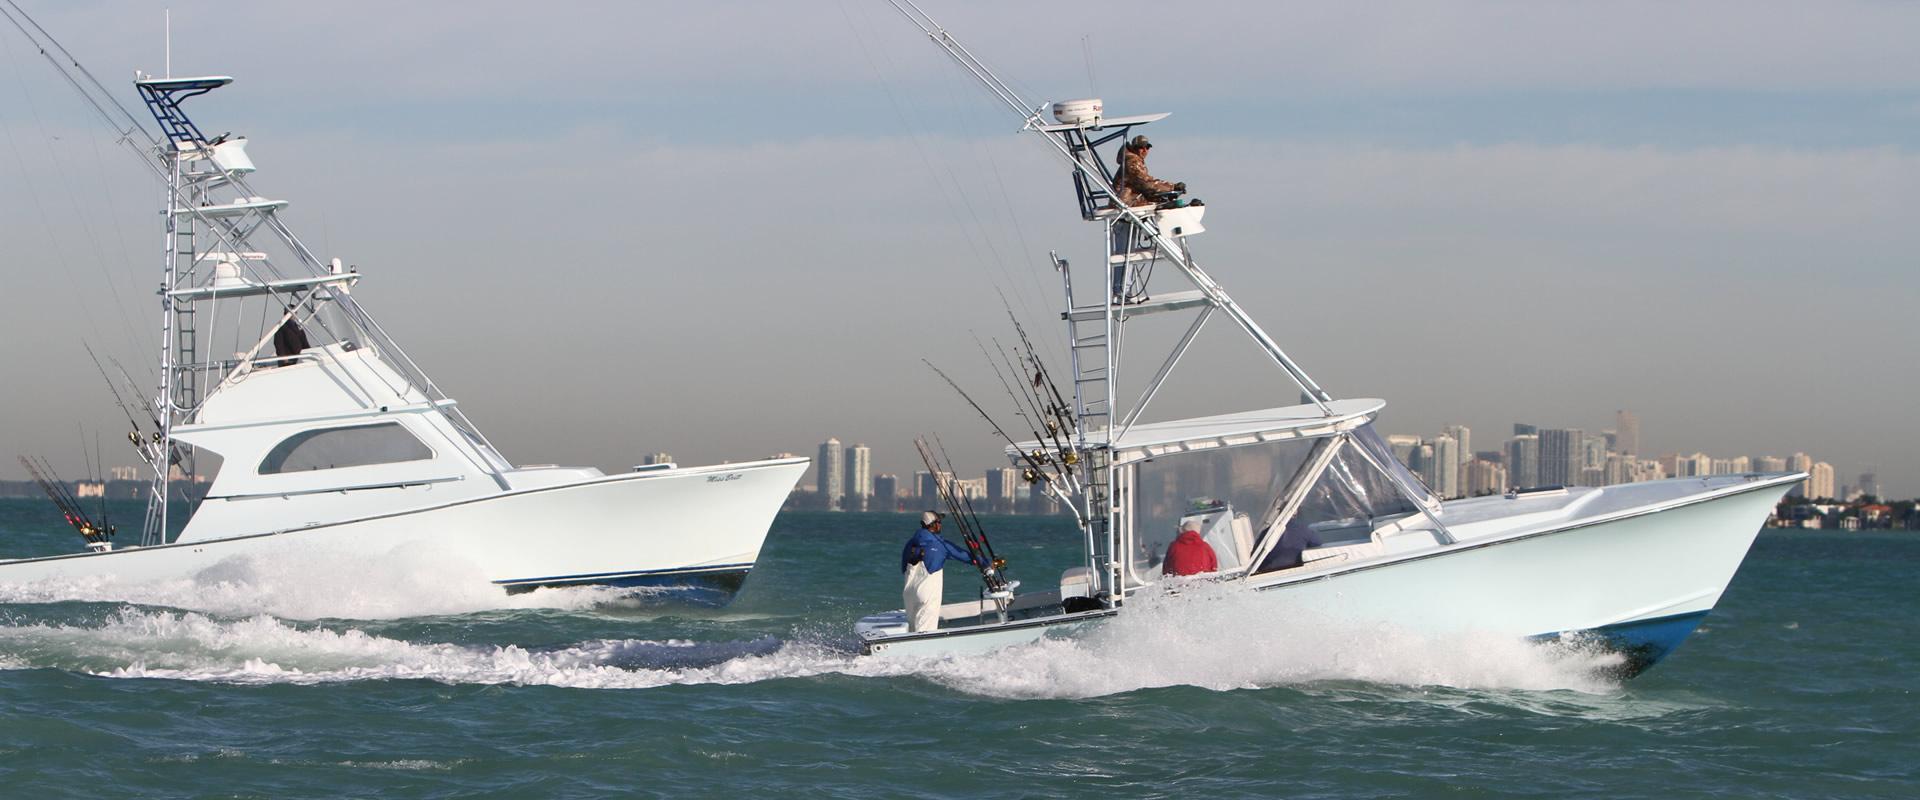 3/4 Day Fishing Charters